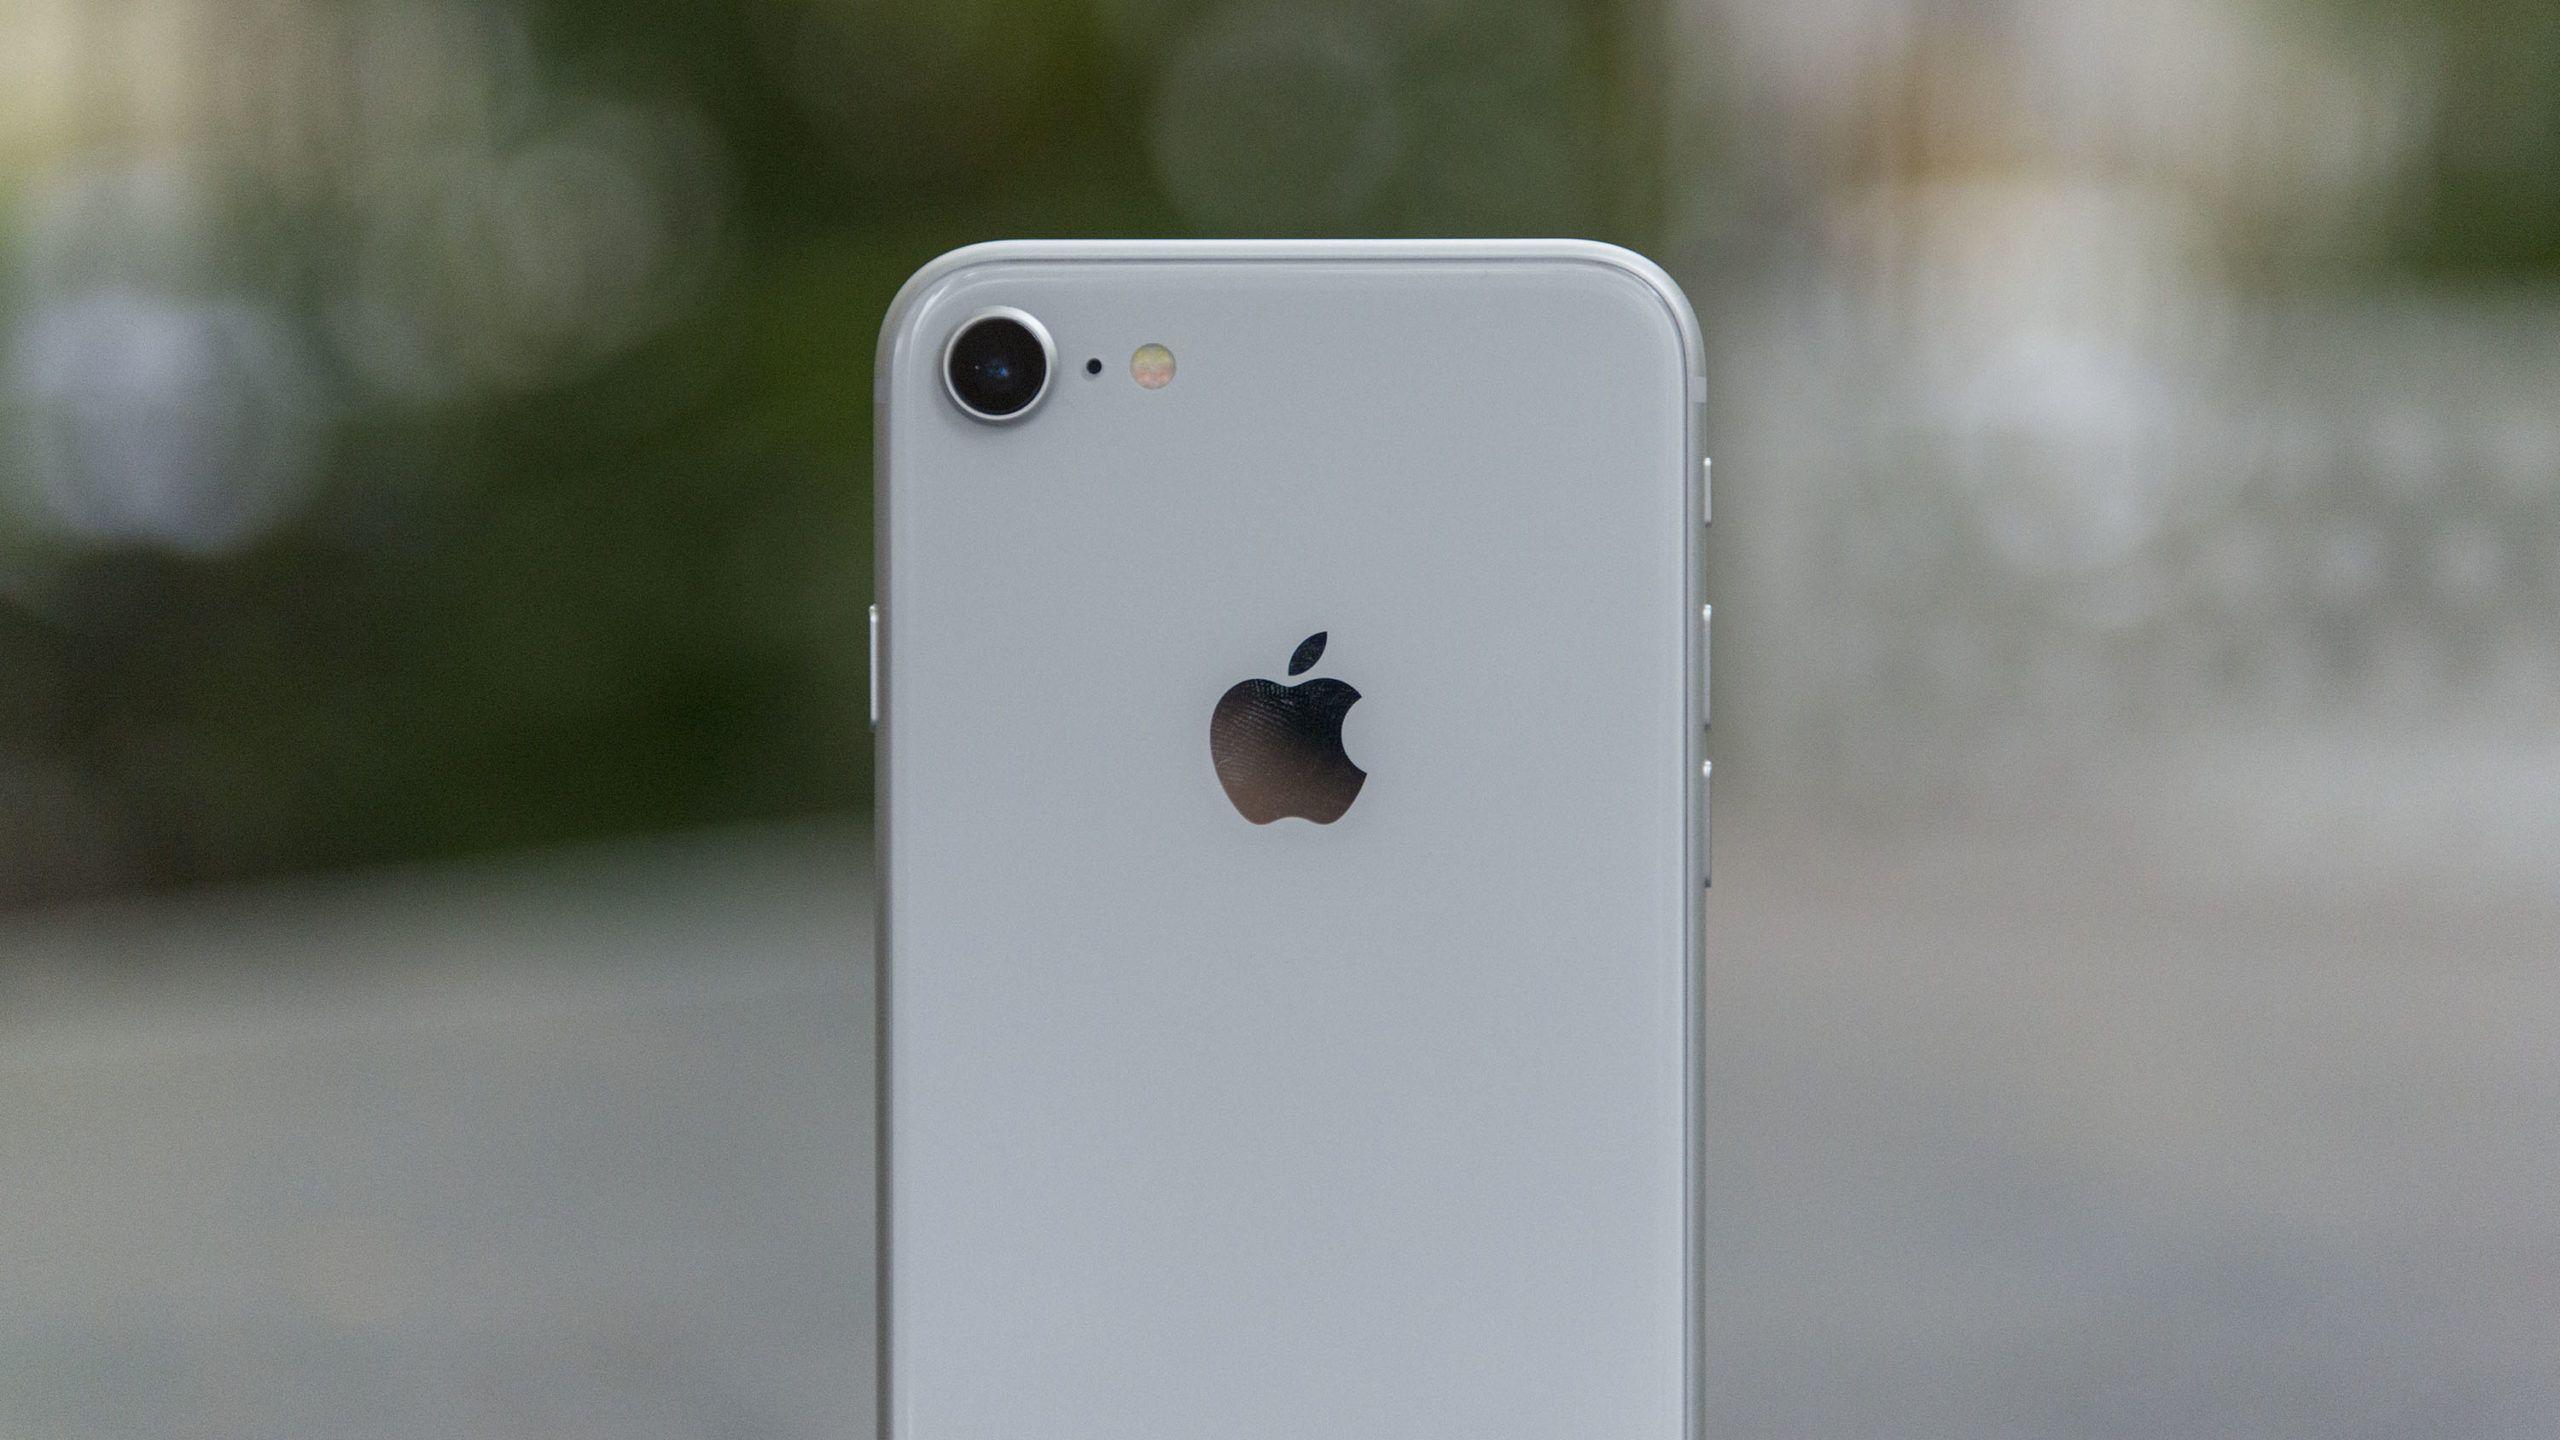 iPhone SE 2 z tylnym aparatem 7 megapikseli?